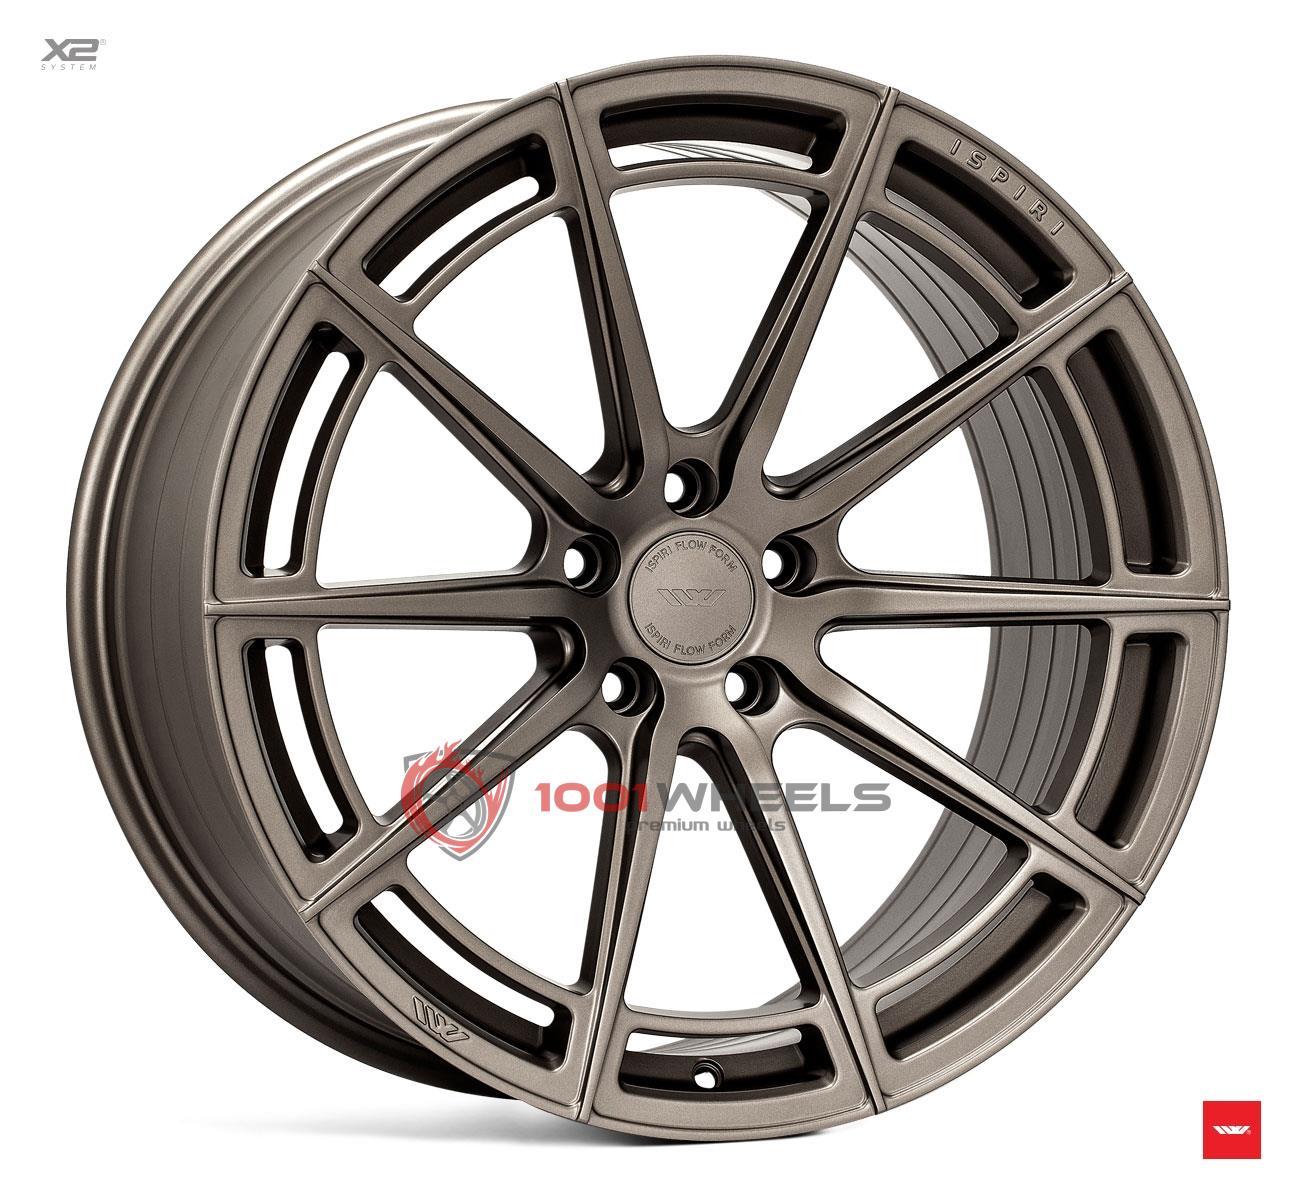 ISPIRI FFR2 matt-carbon-bronze